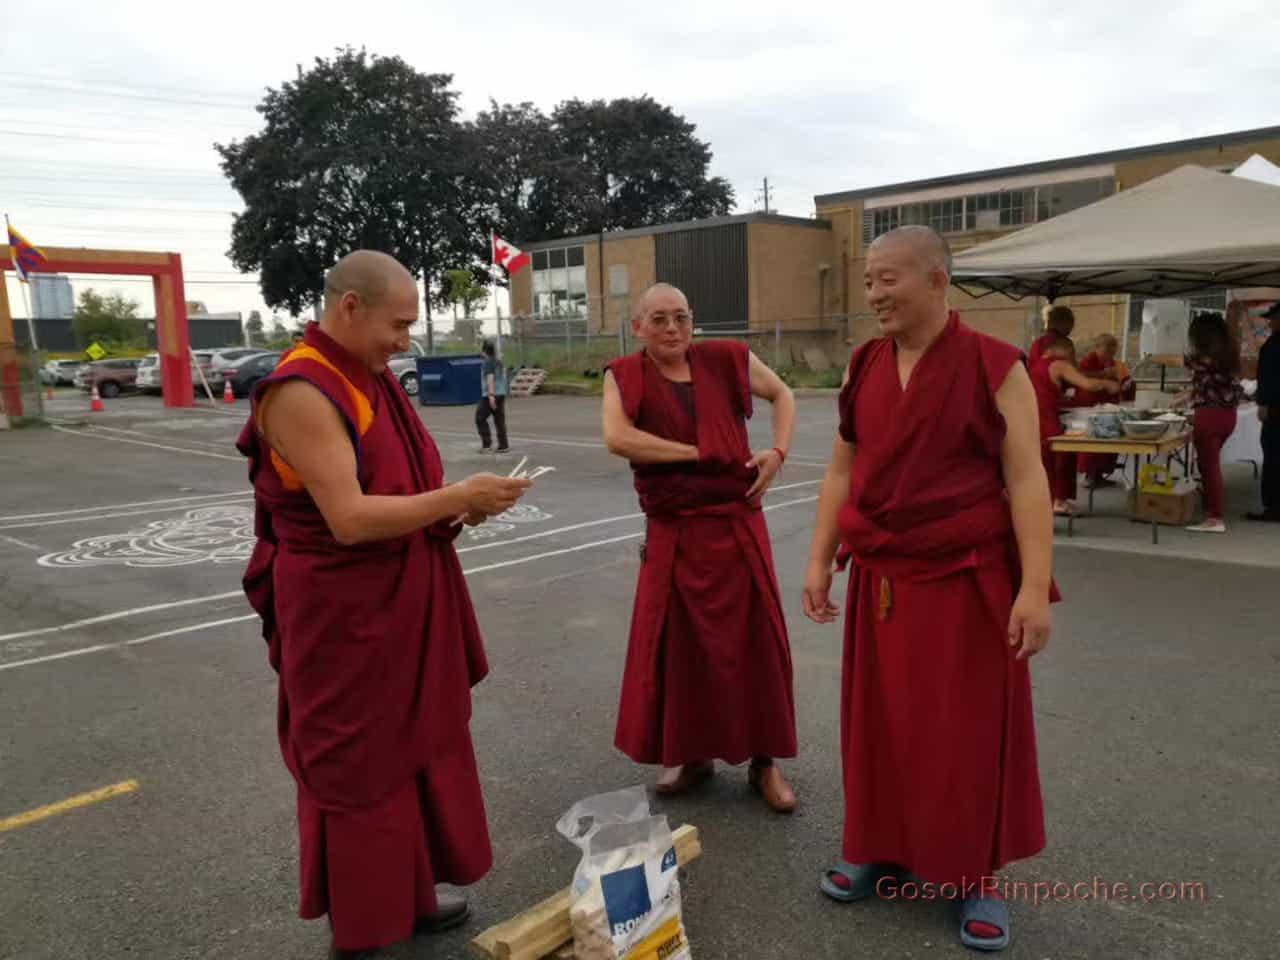 Gosok Rinpoche fire puja 20190924112158